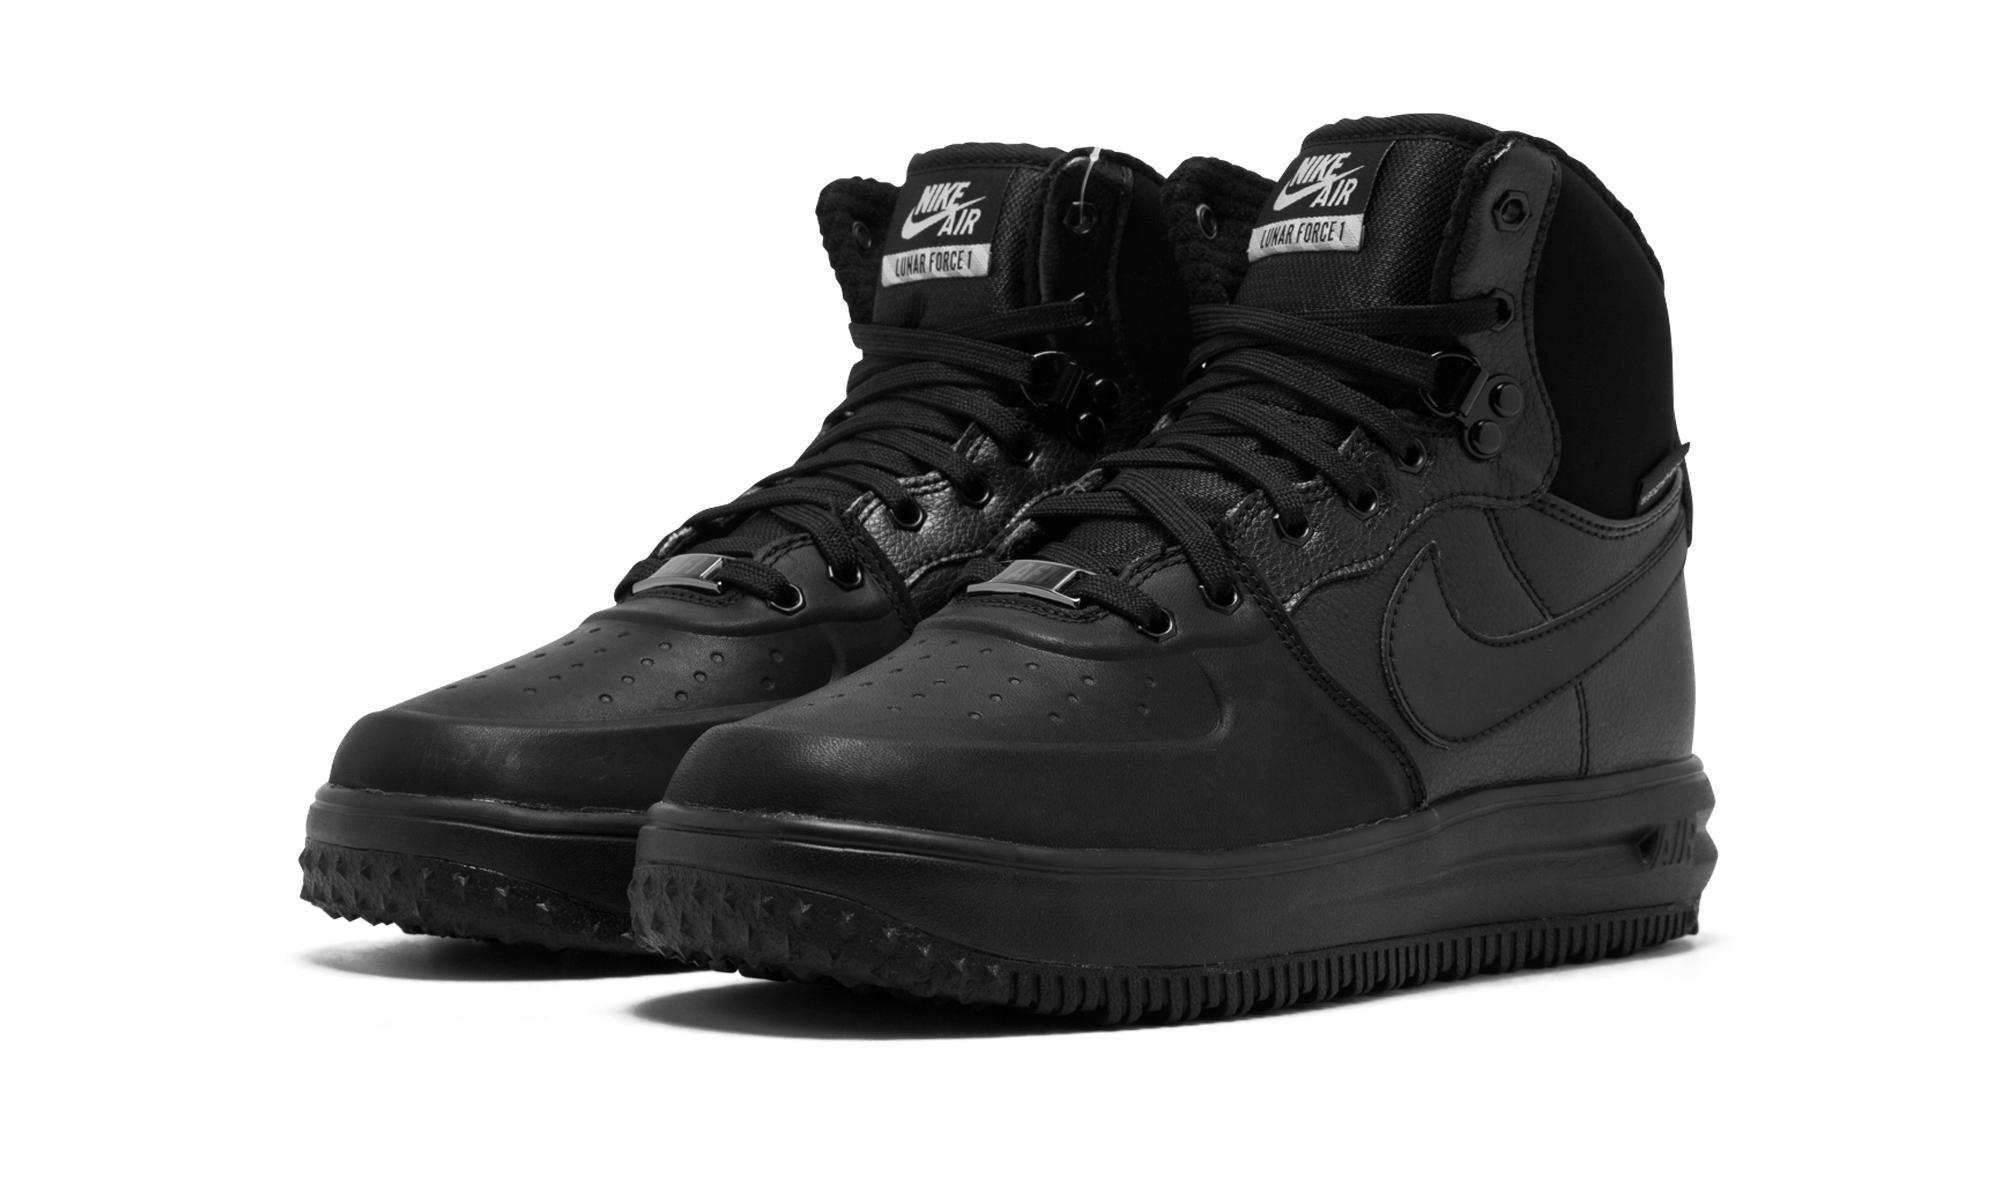 9dea65672da6 ... Nike - Black Lunar Force 1 Sneakerboot Gs - Lyst.